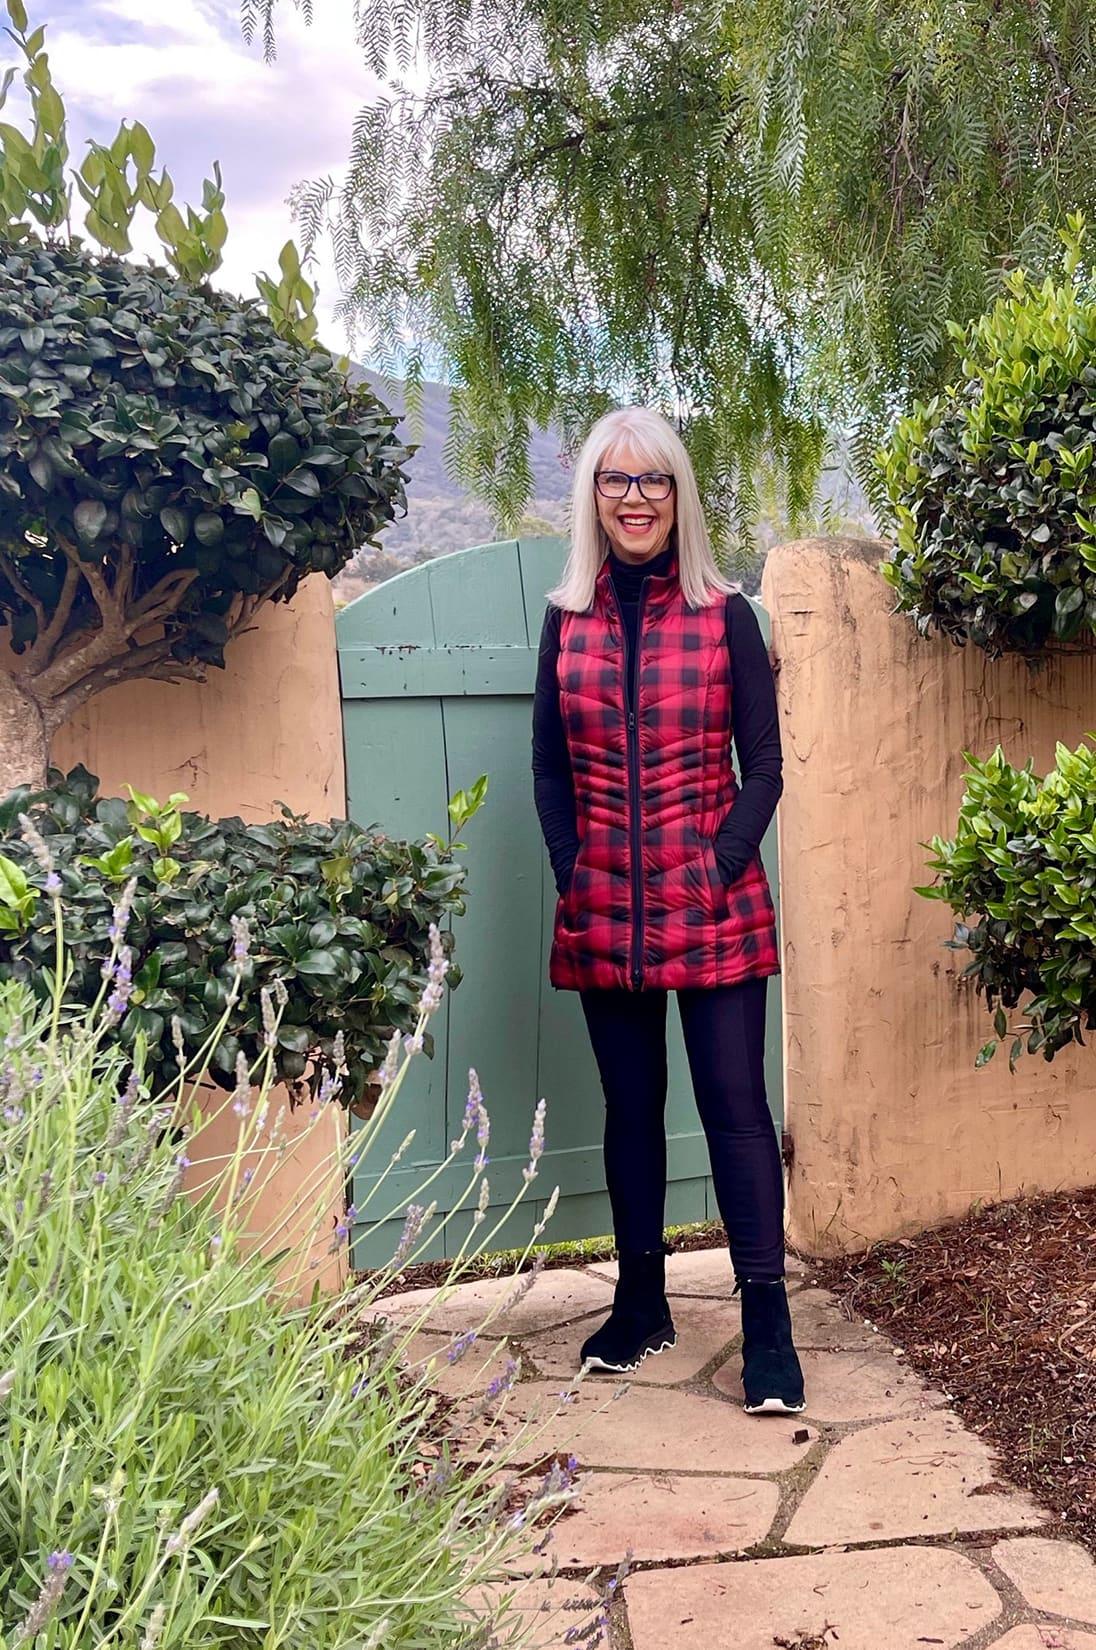 Cindy Hattersley in J Jill Vest and Sorrel boots